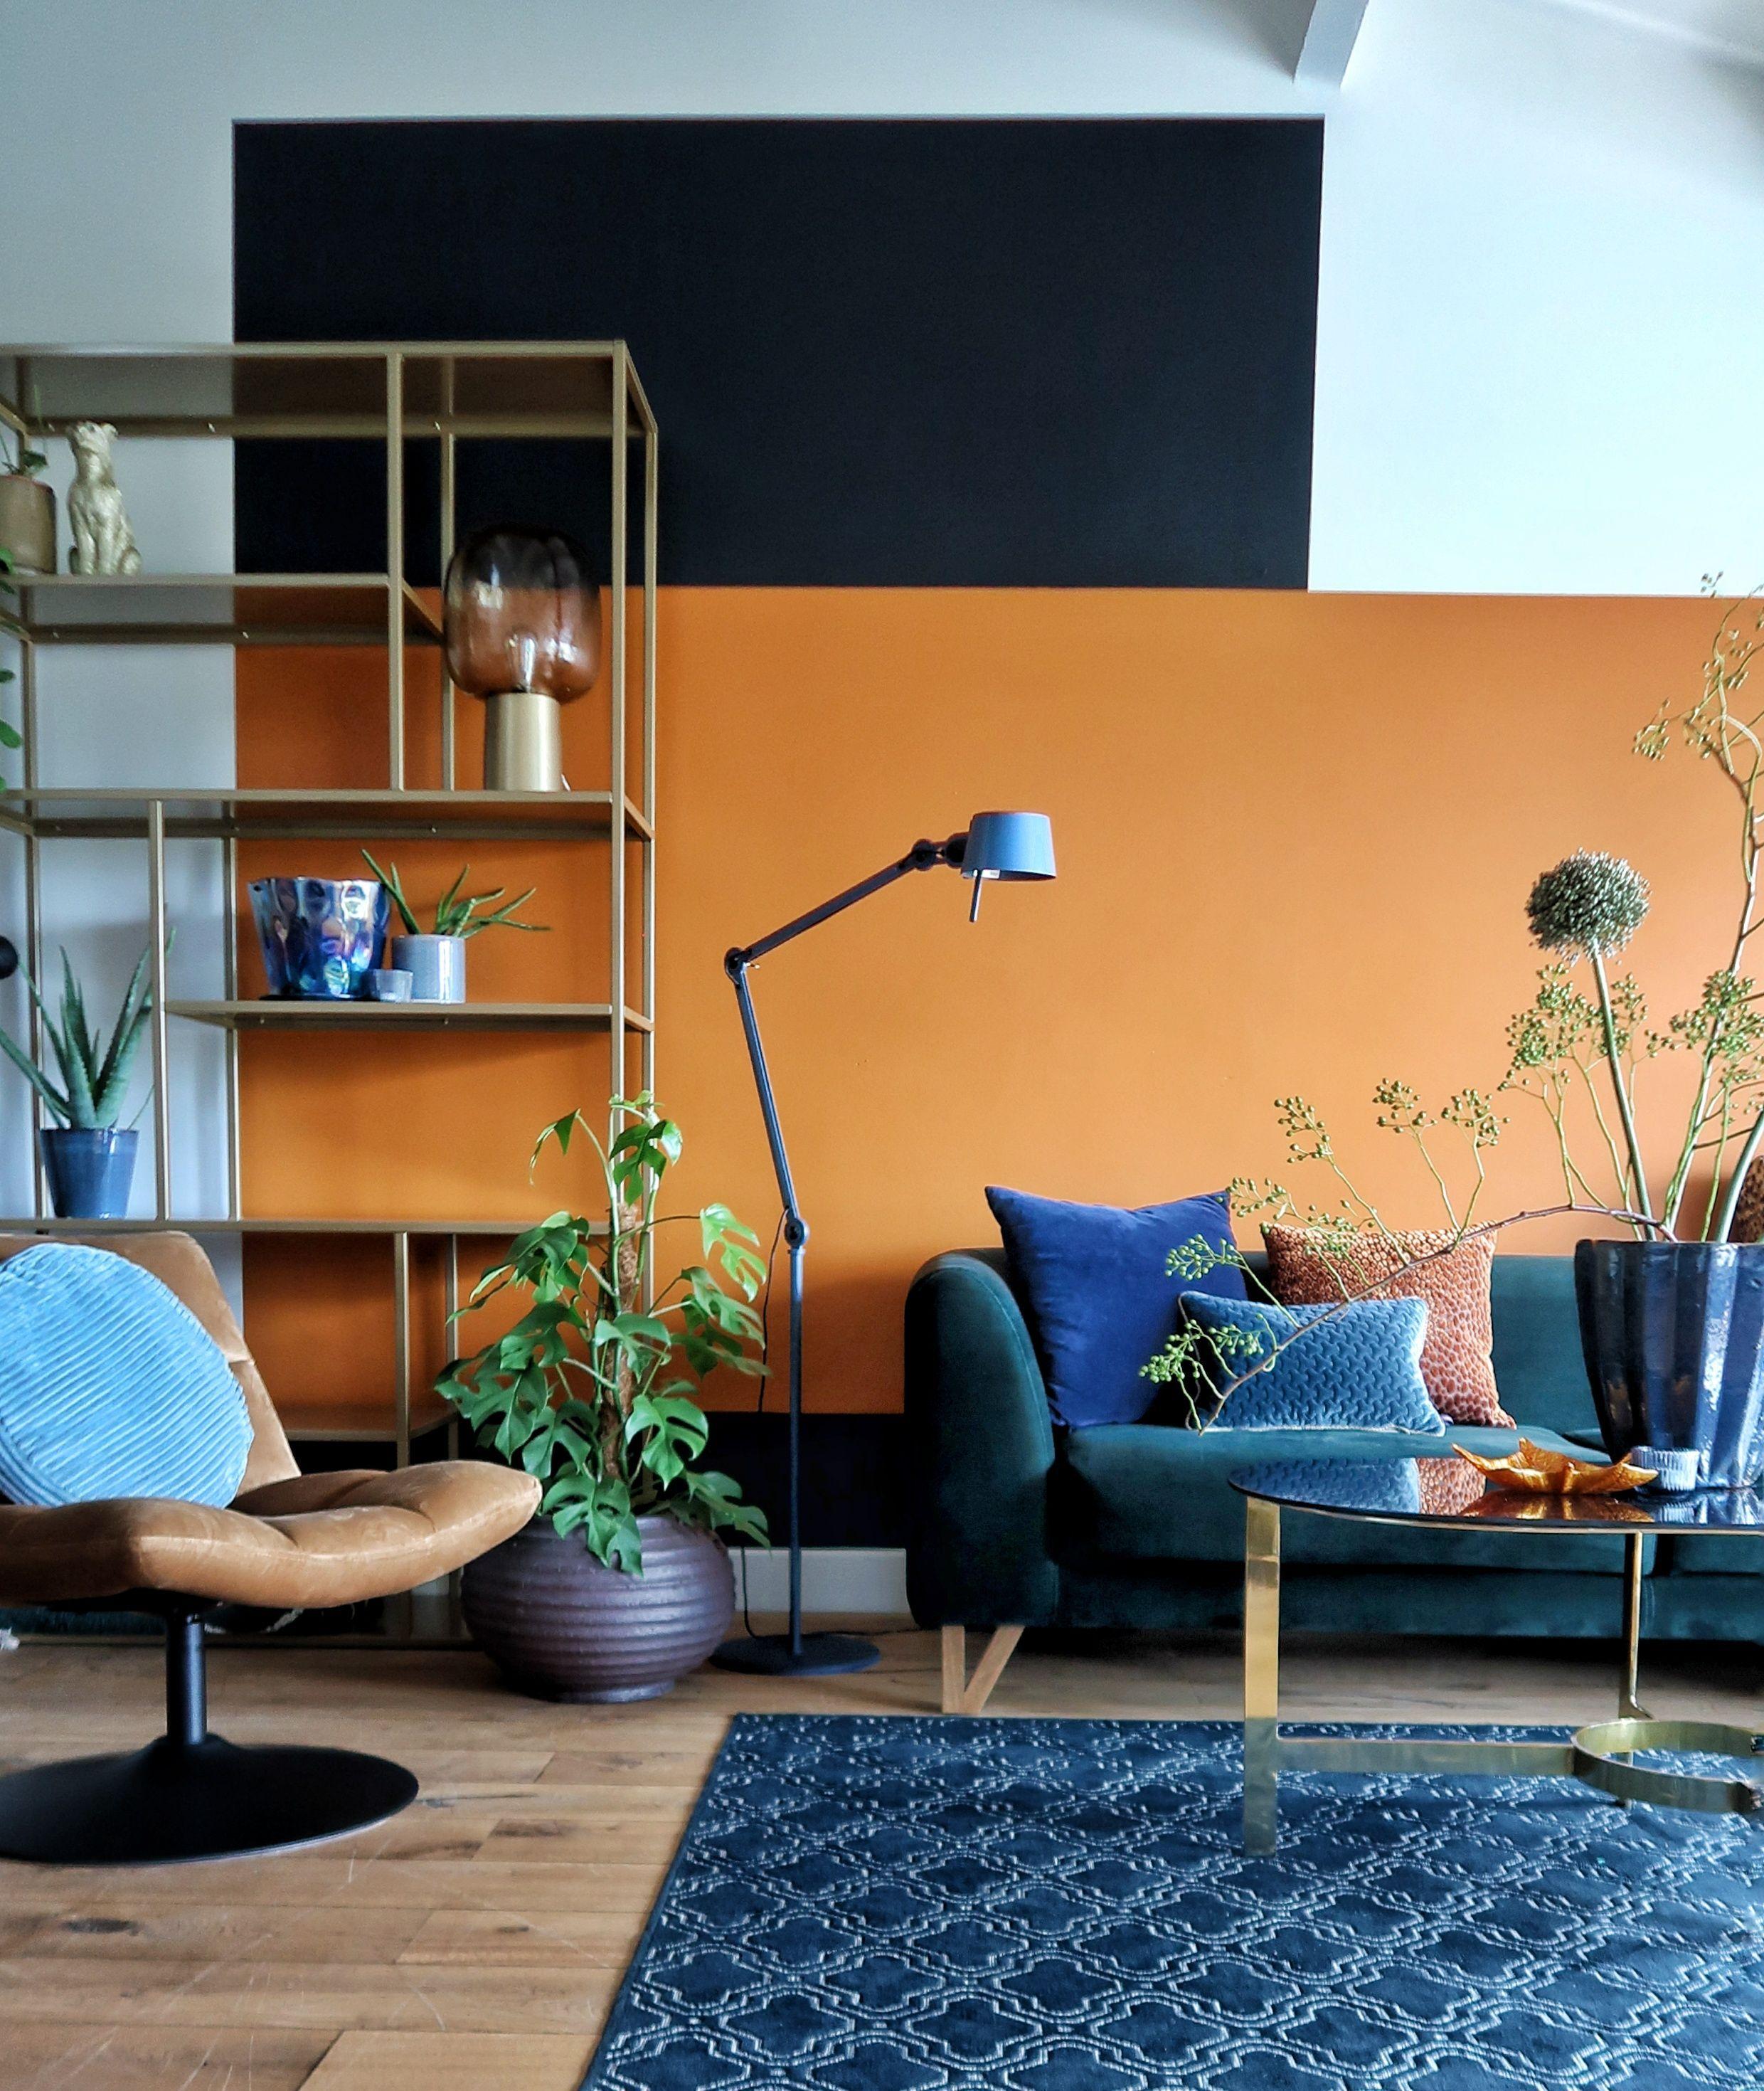 Klaar Voor Kleur Denim Drift Indian Spice Flexa Woonkamer Metamorfose Mid Century Modern Living Room Decor Perfect Living Room Decor Living Room Wall Designs